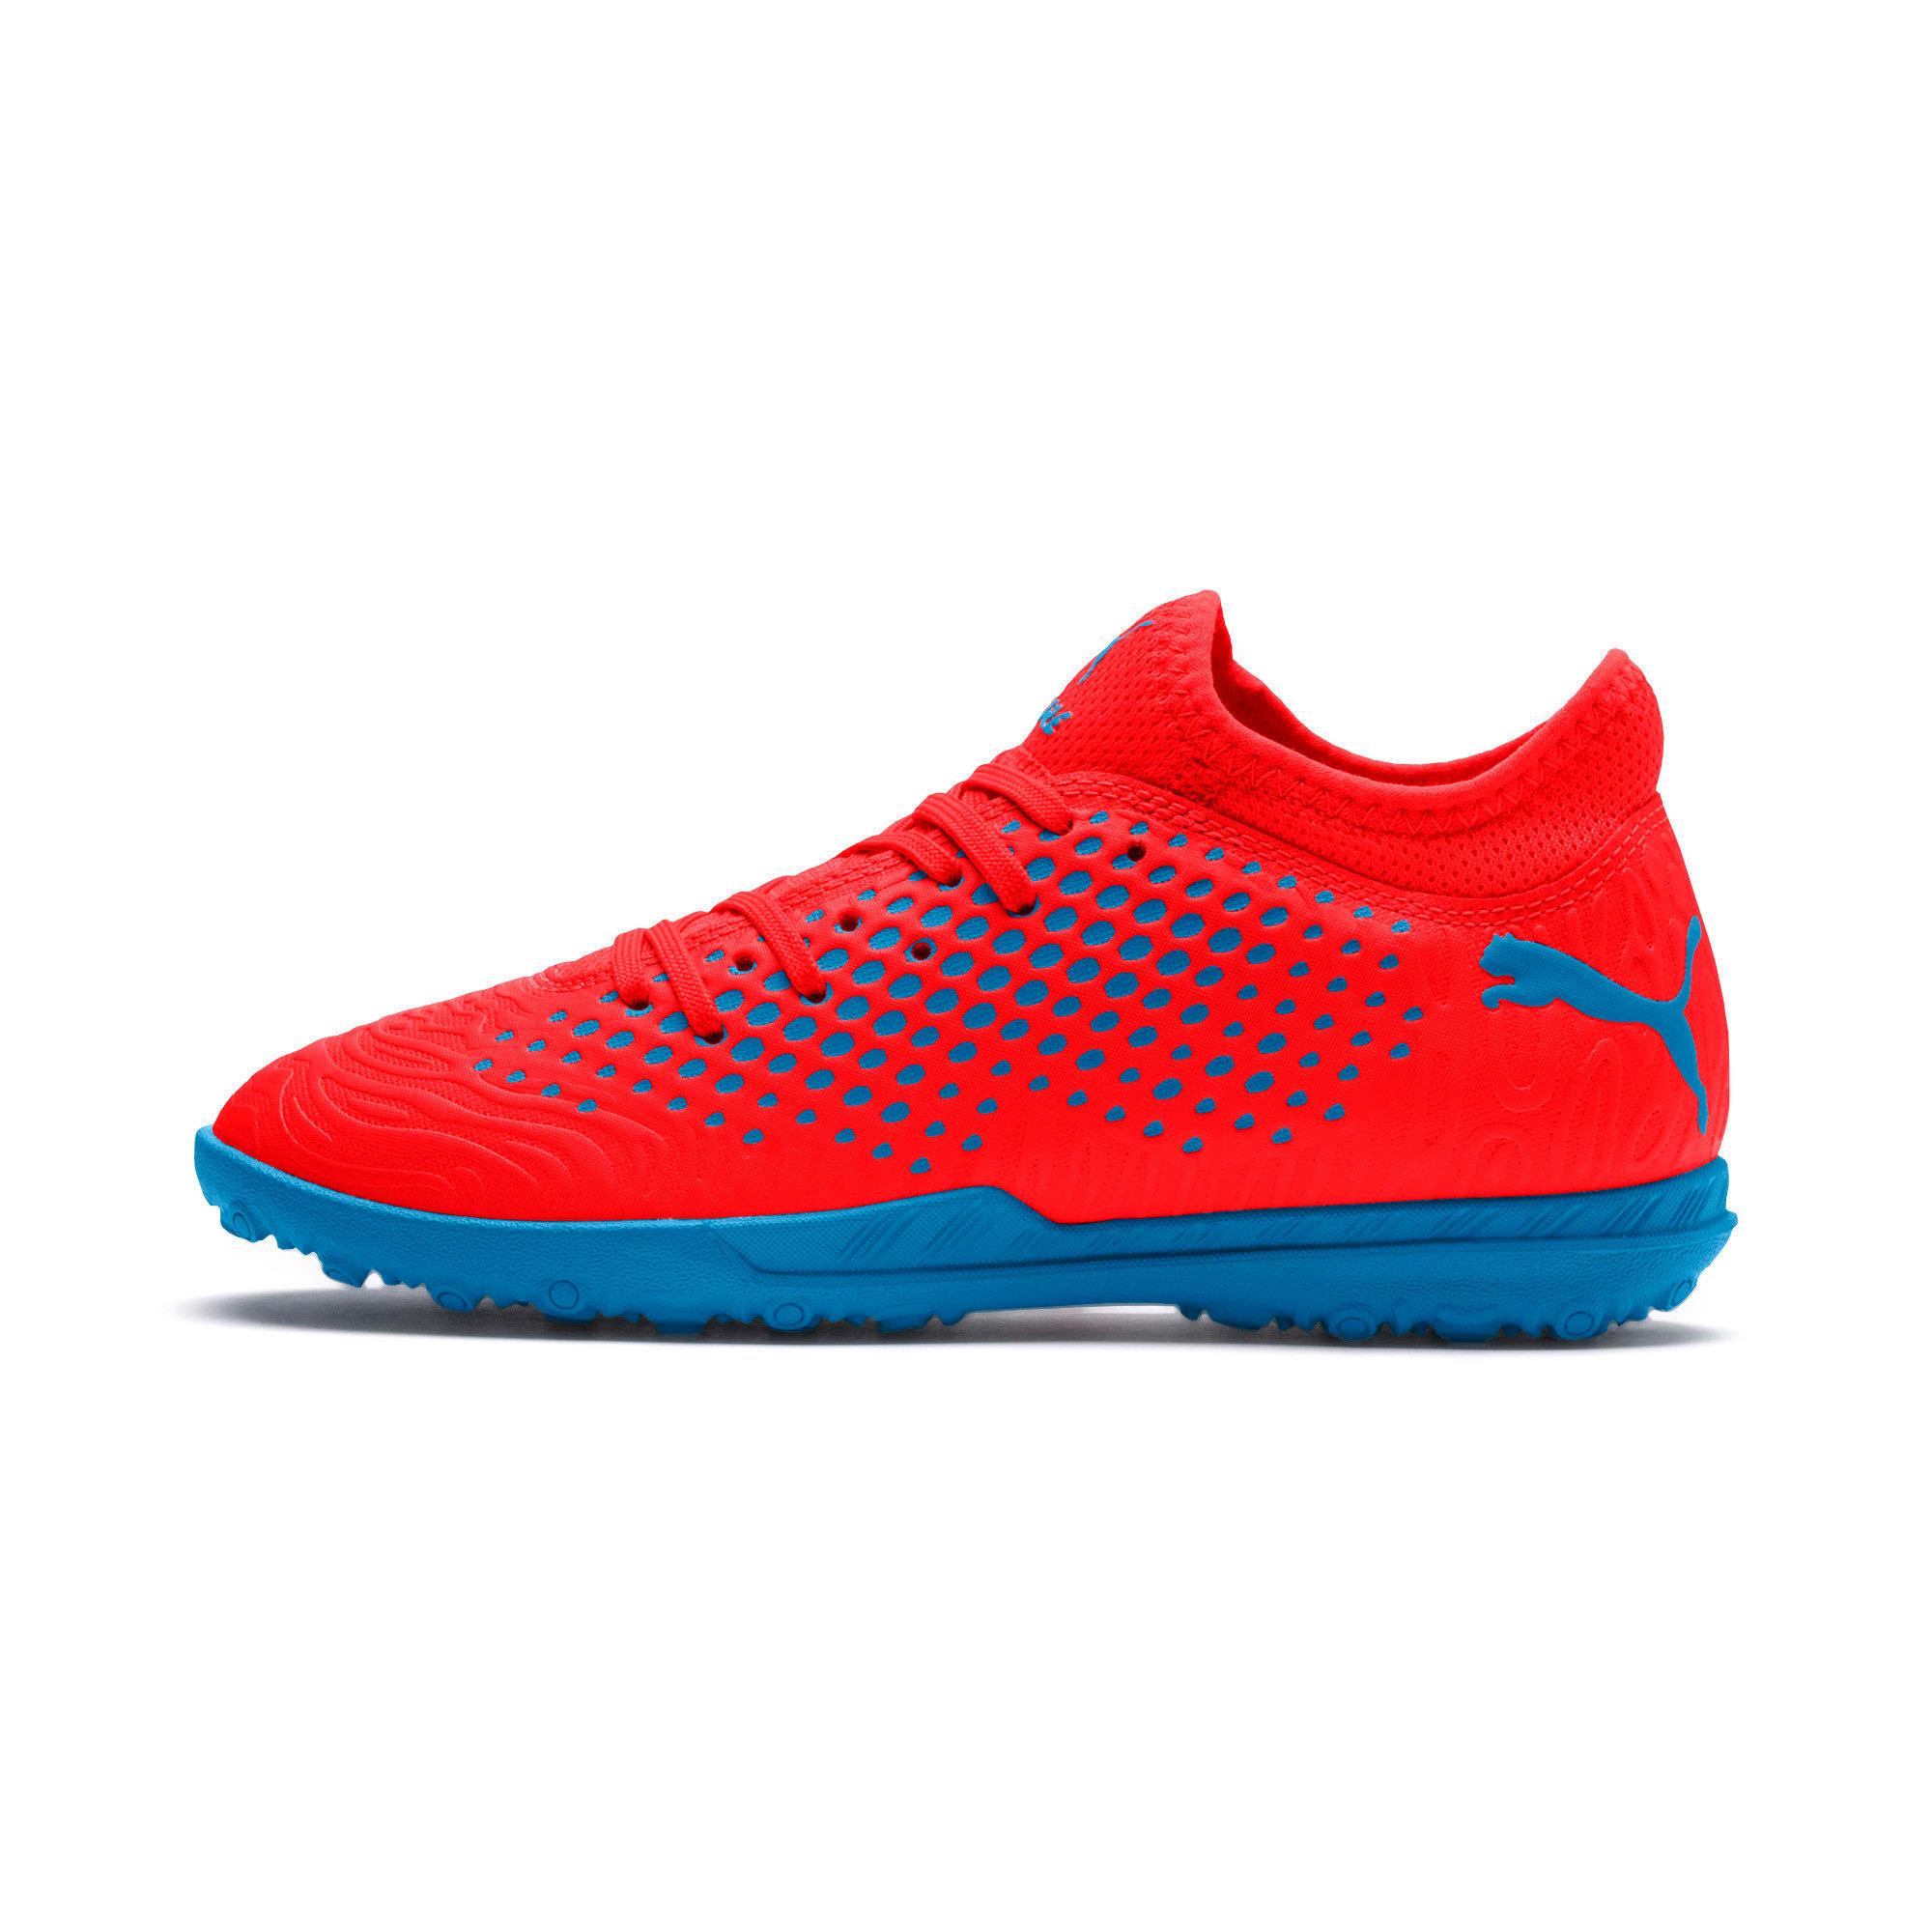 Thumbnail 1 of FUTURE 19.4 TT Soccer Shoes JR, Red Blast-Bleu Azur, medium